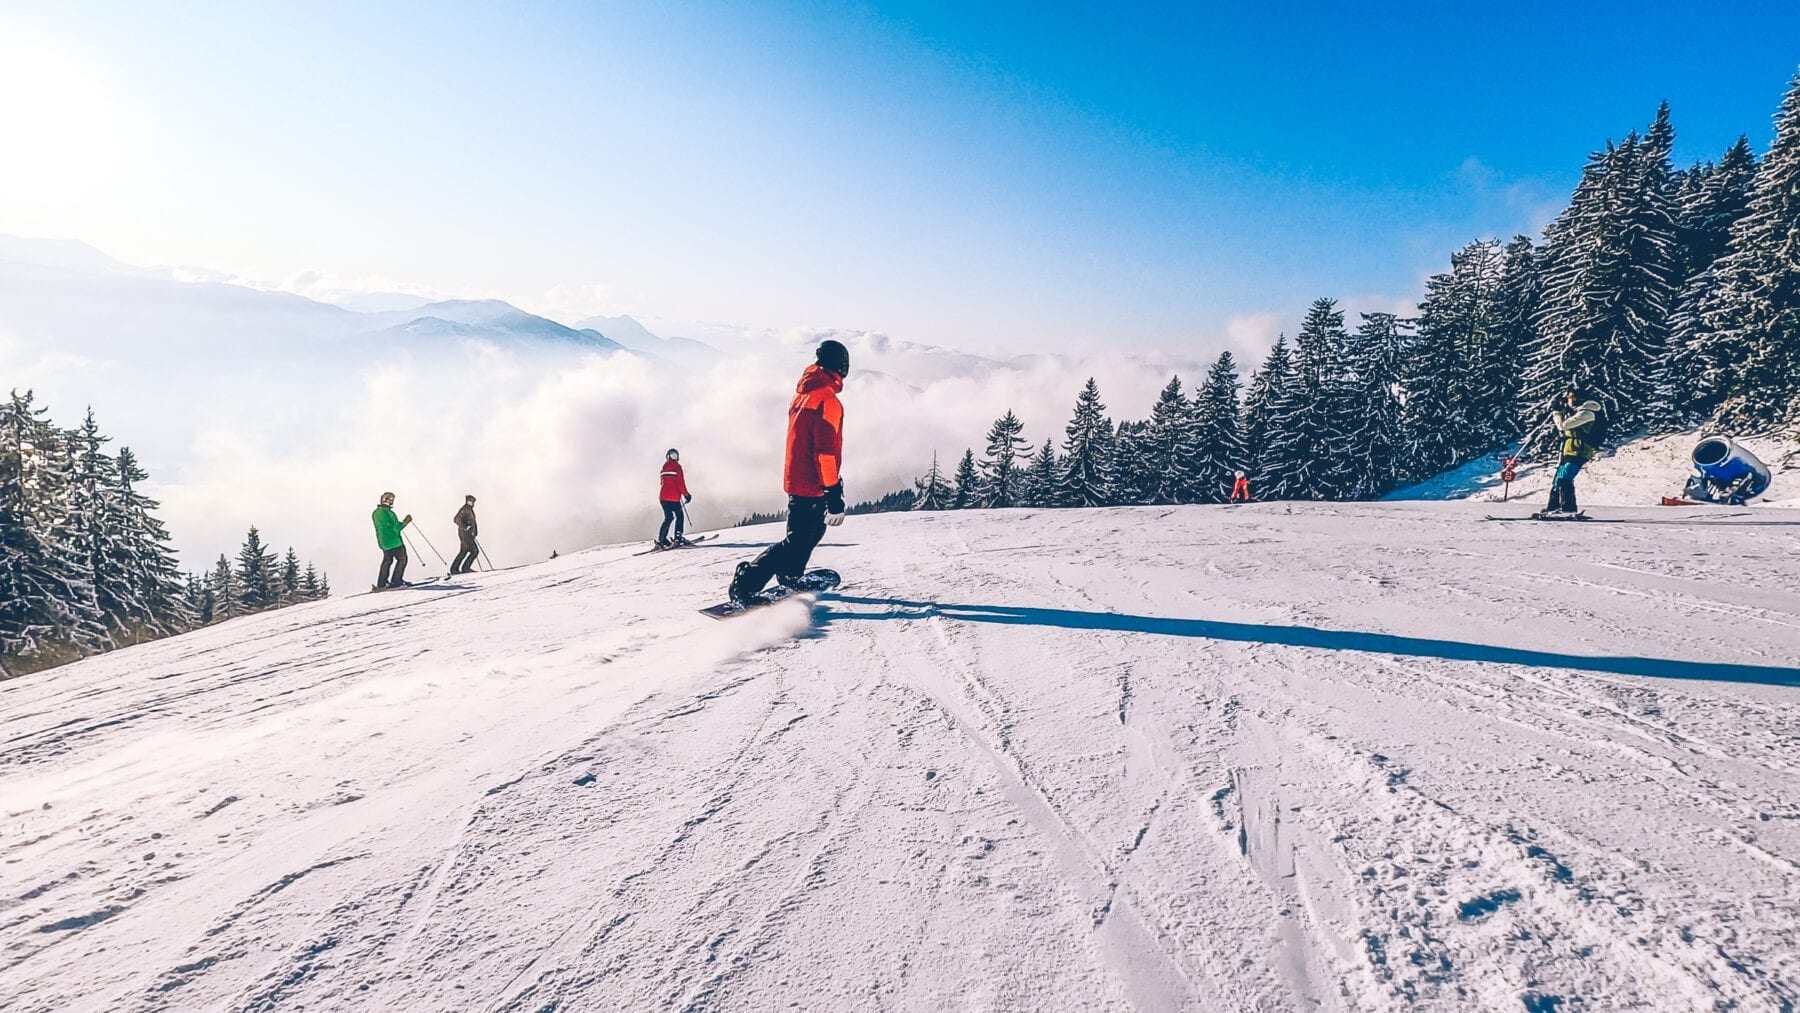 SkiWelt snowboard